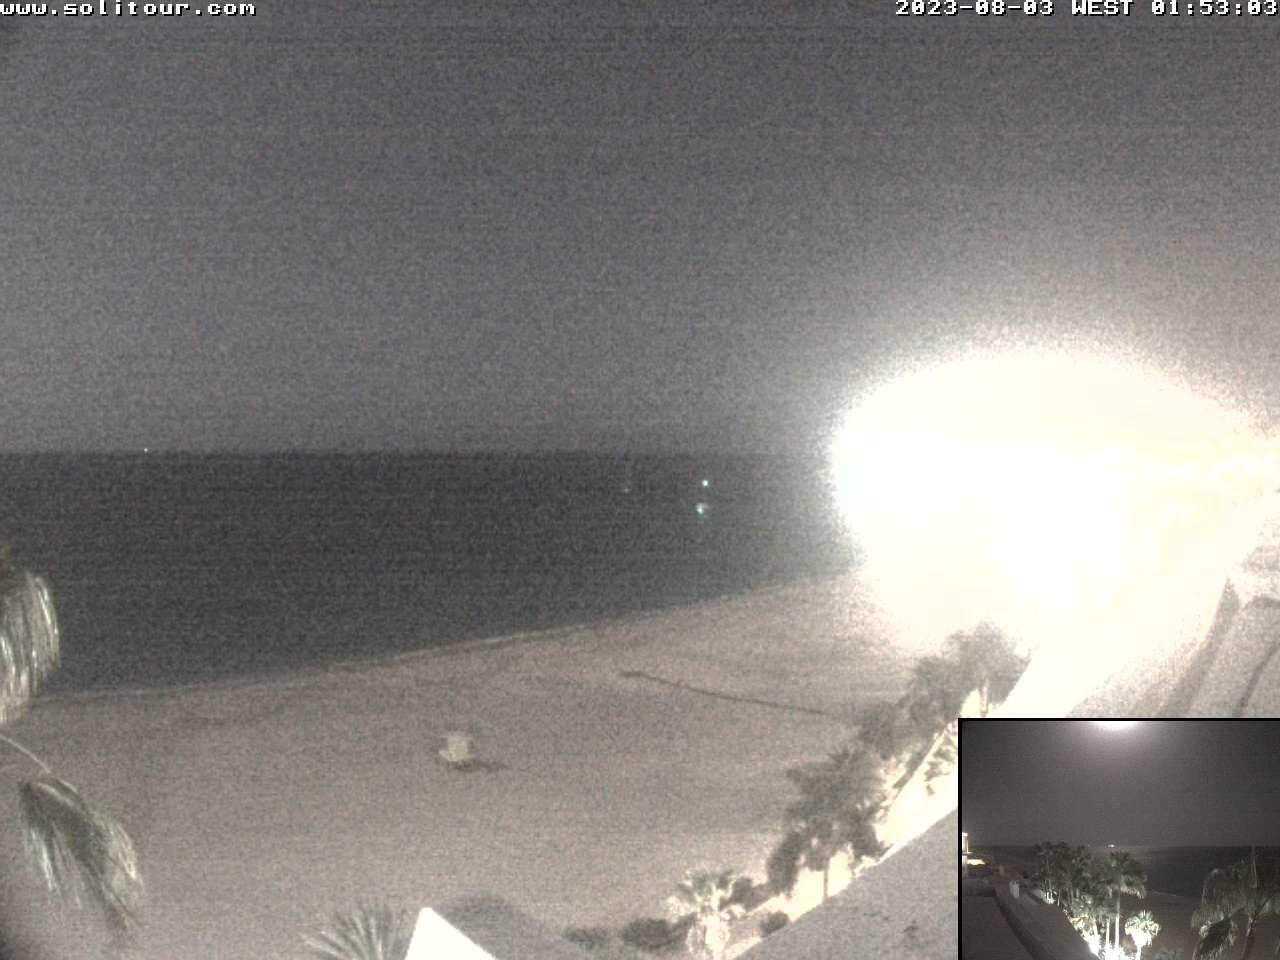 Jandia (Fuerteventura) Fri. 01:53